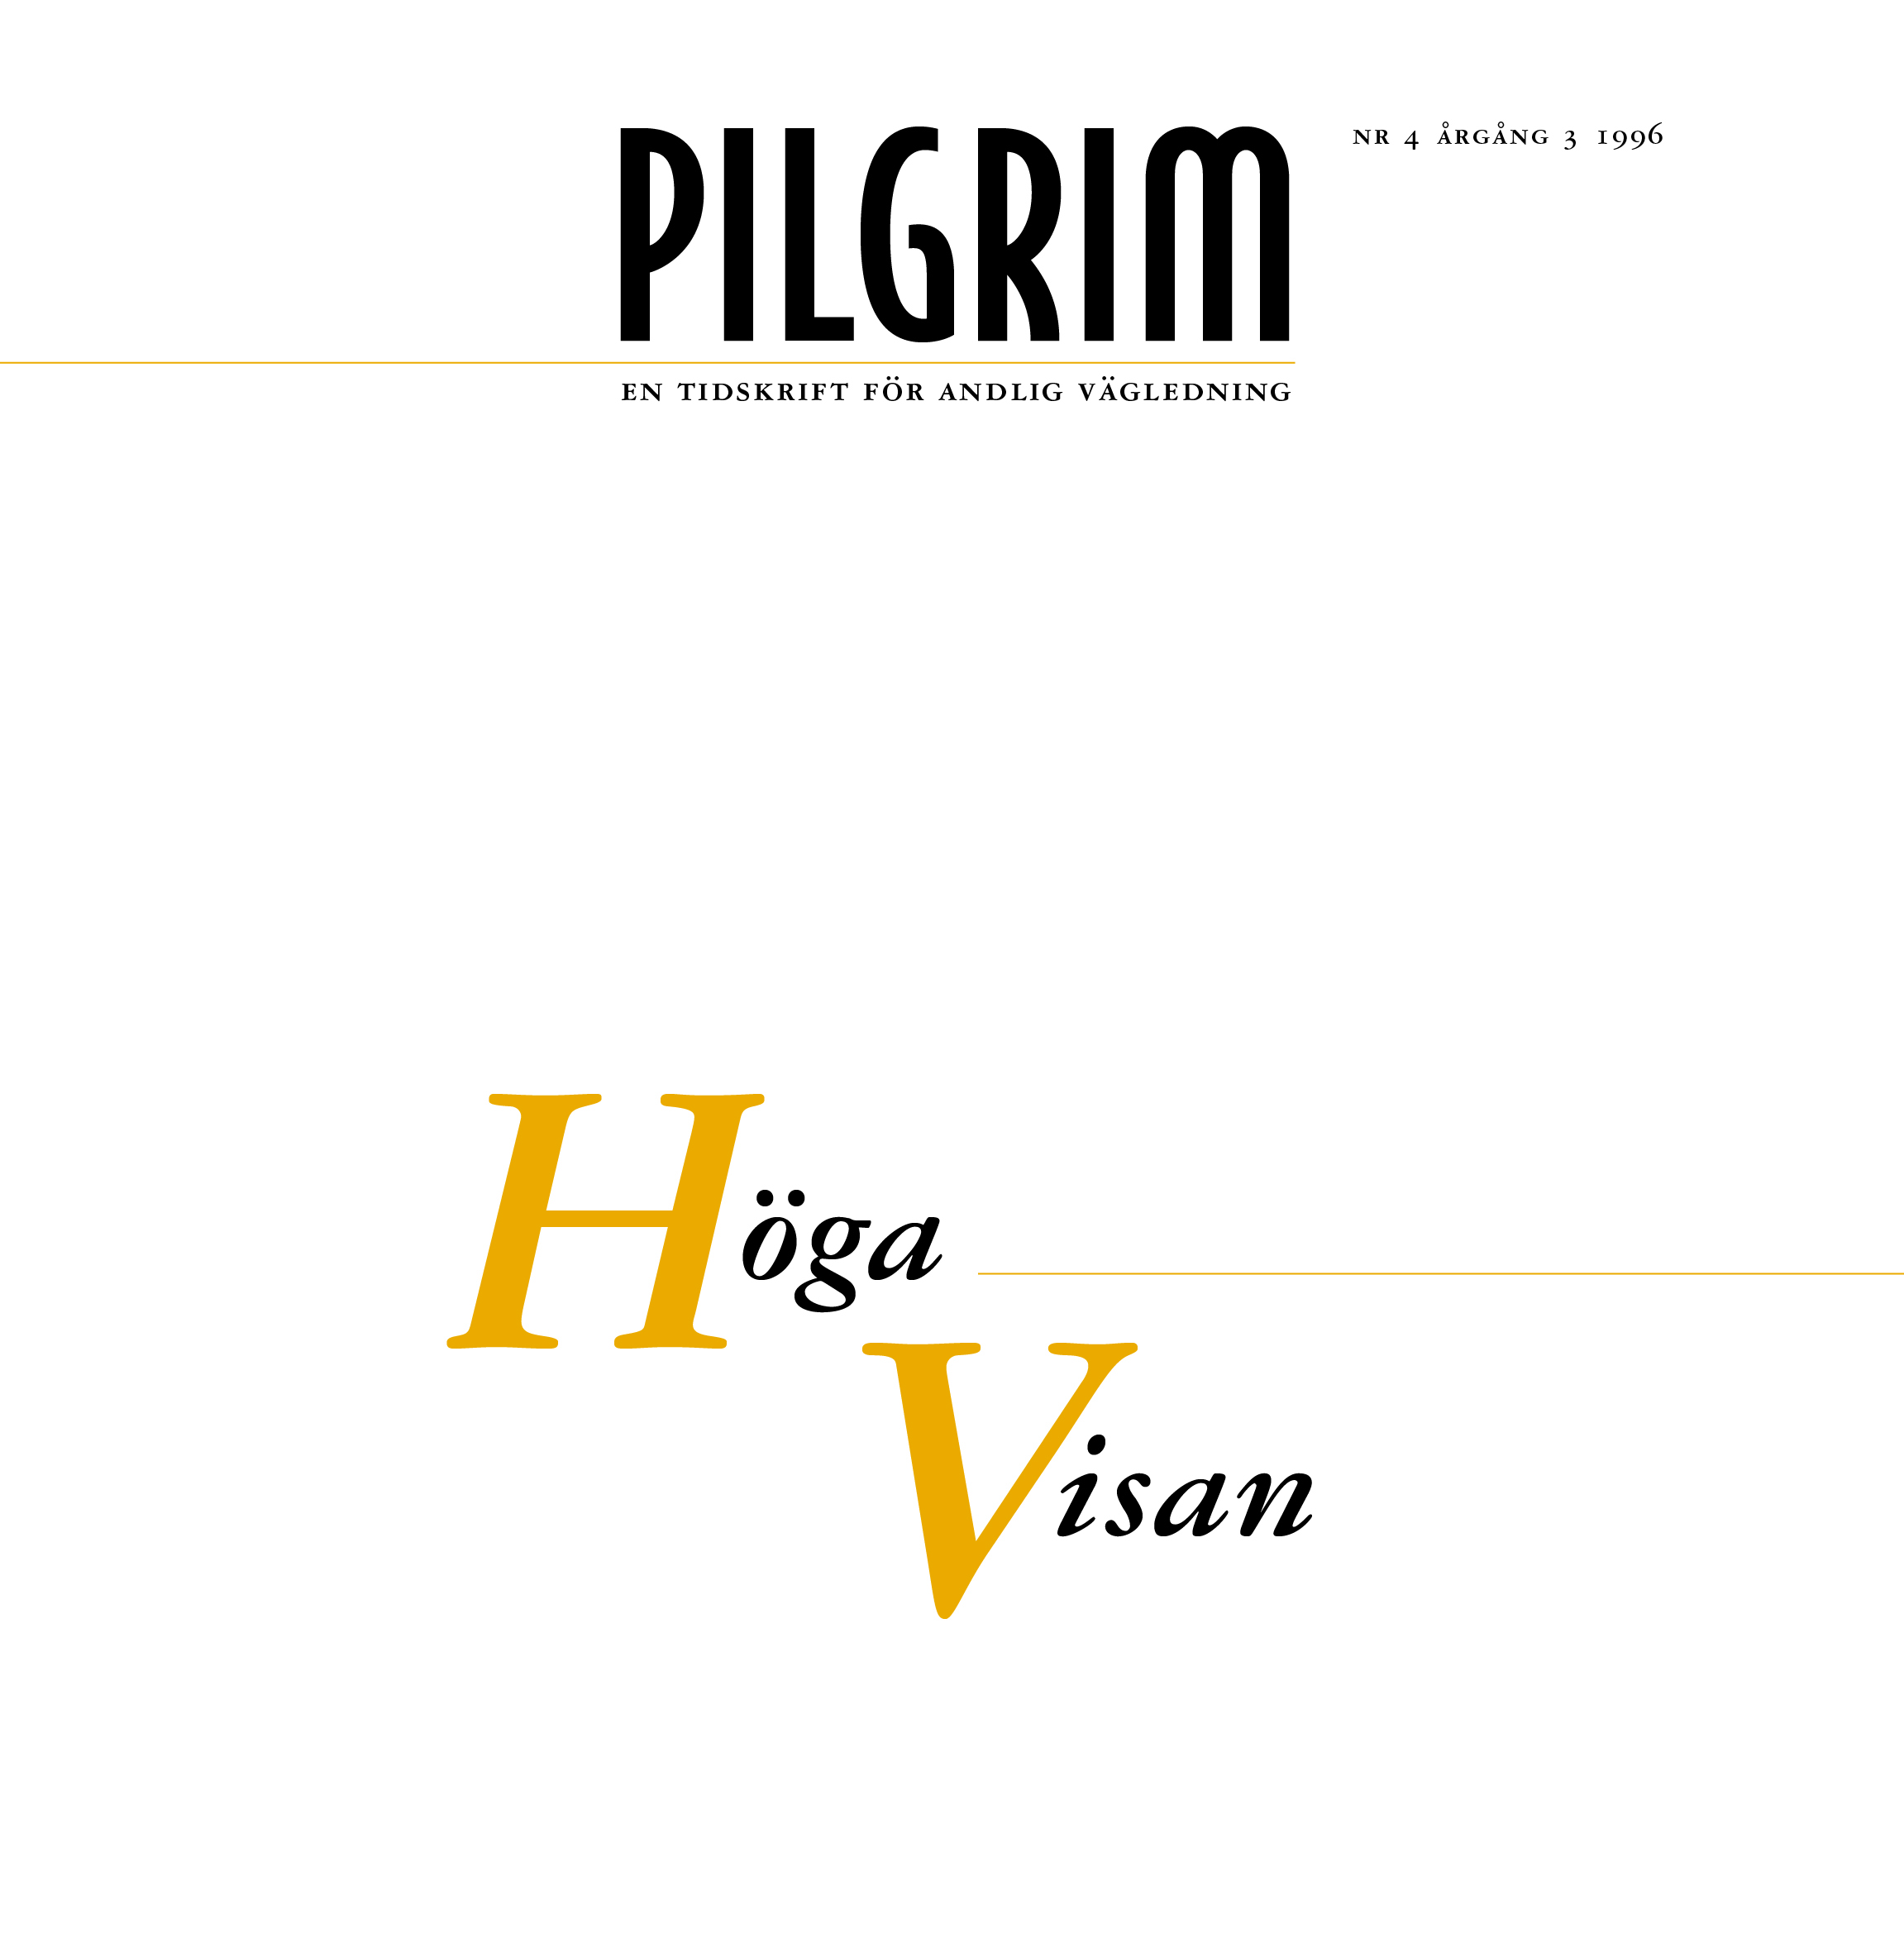 Pilgrim frams 1996-4